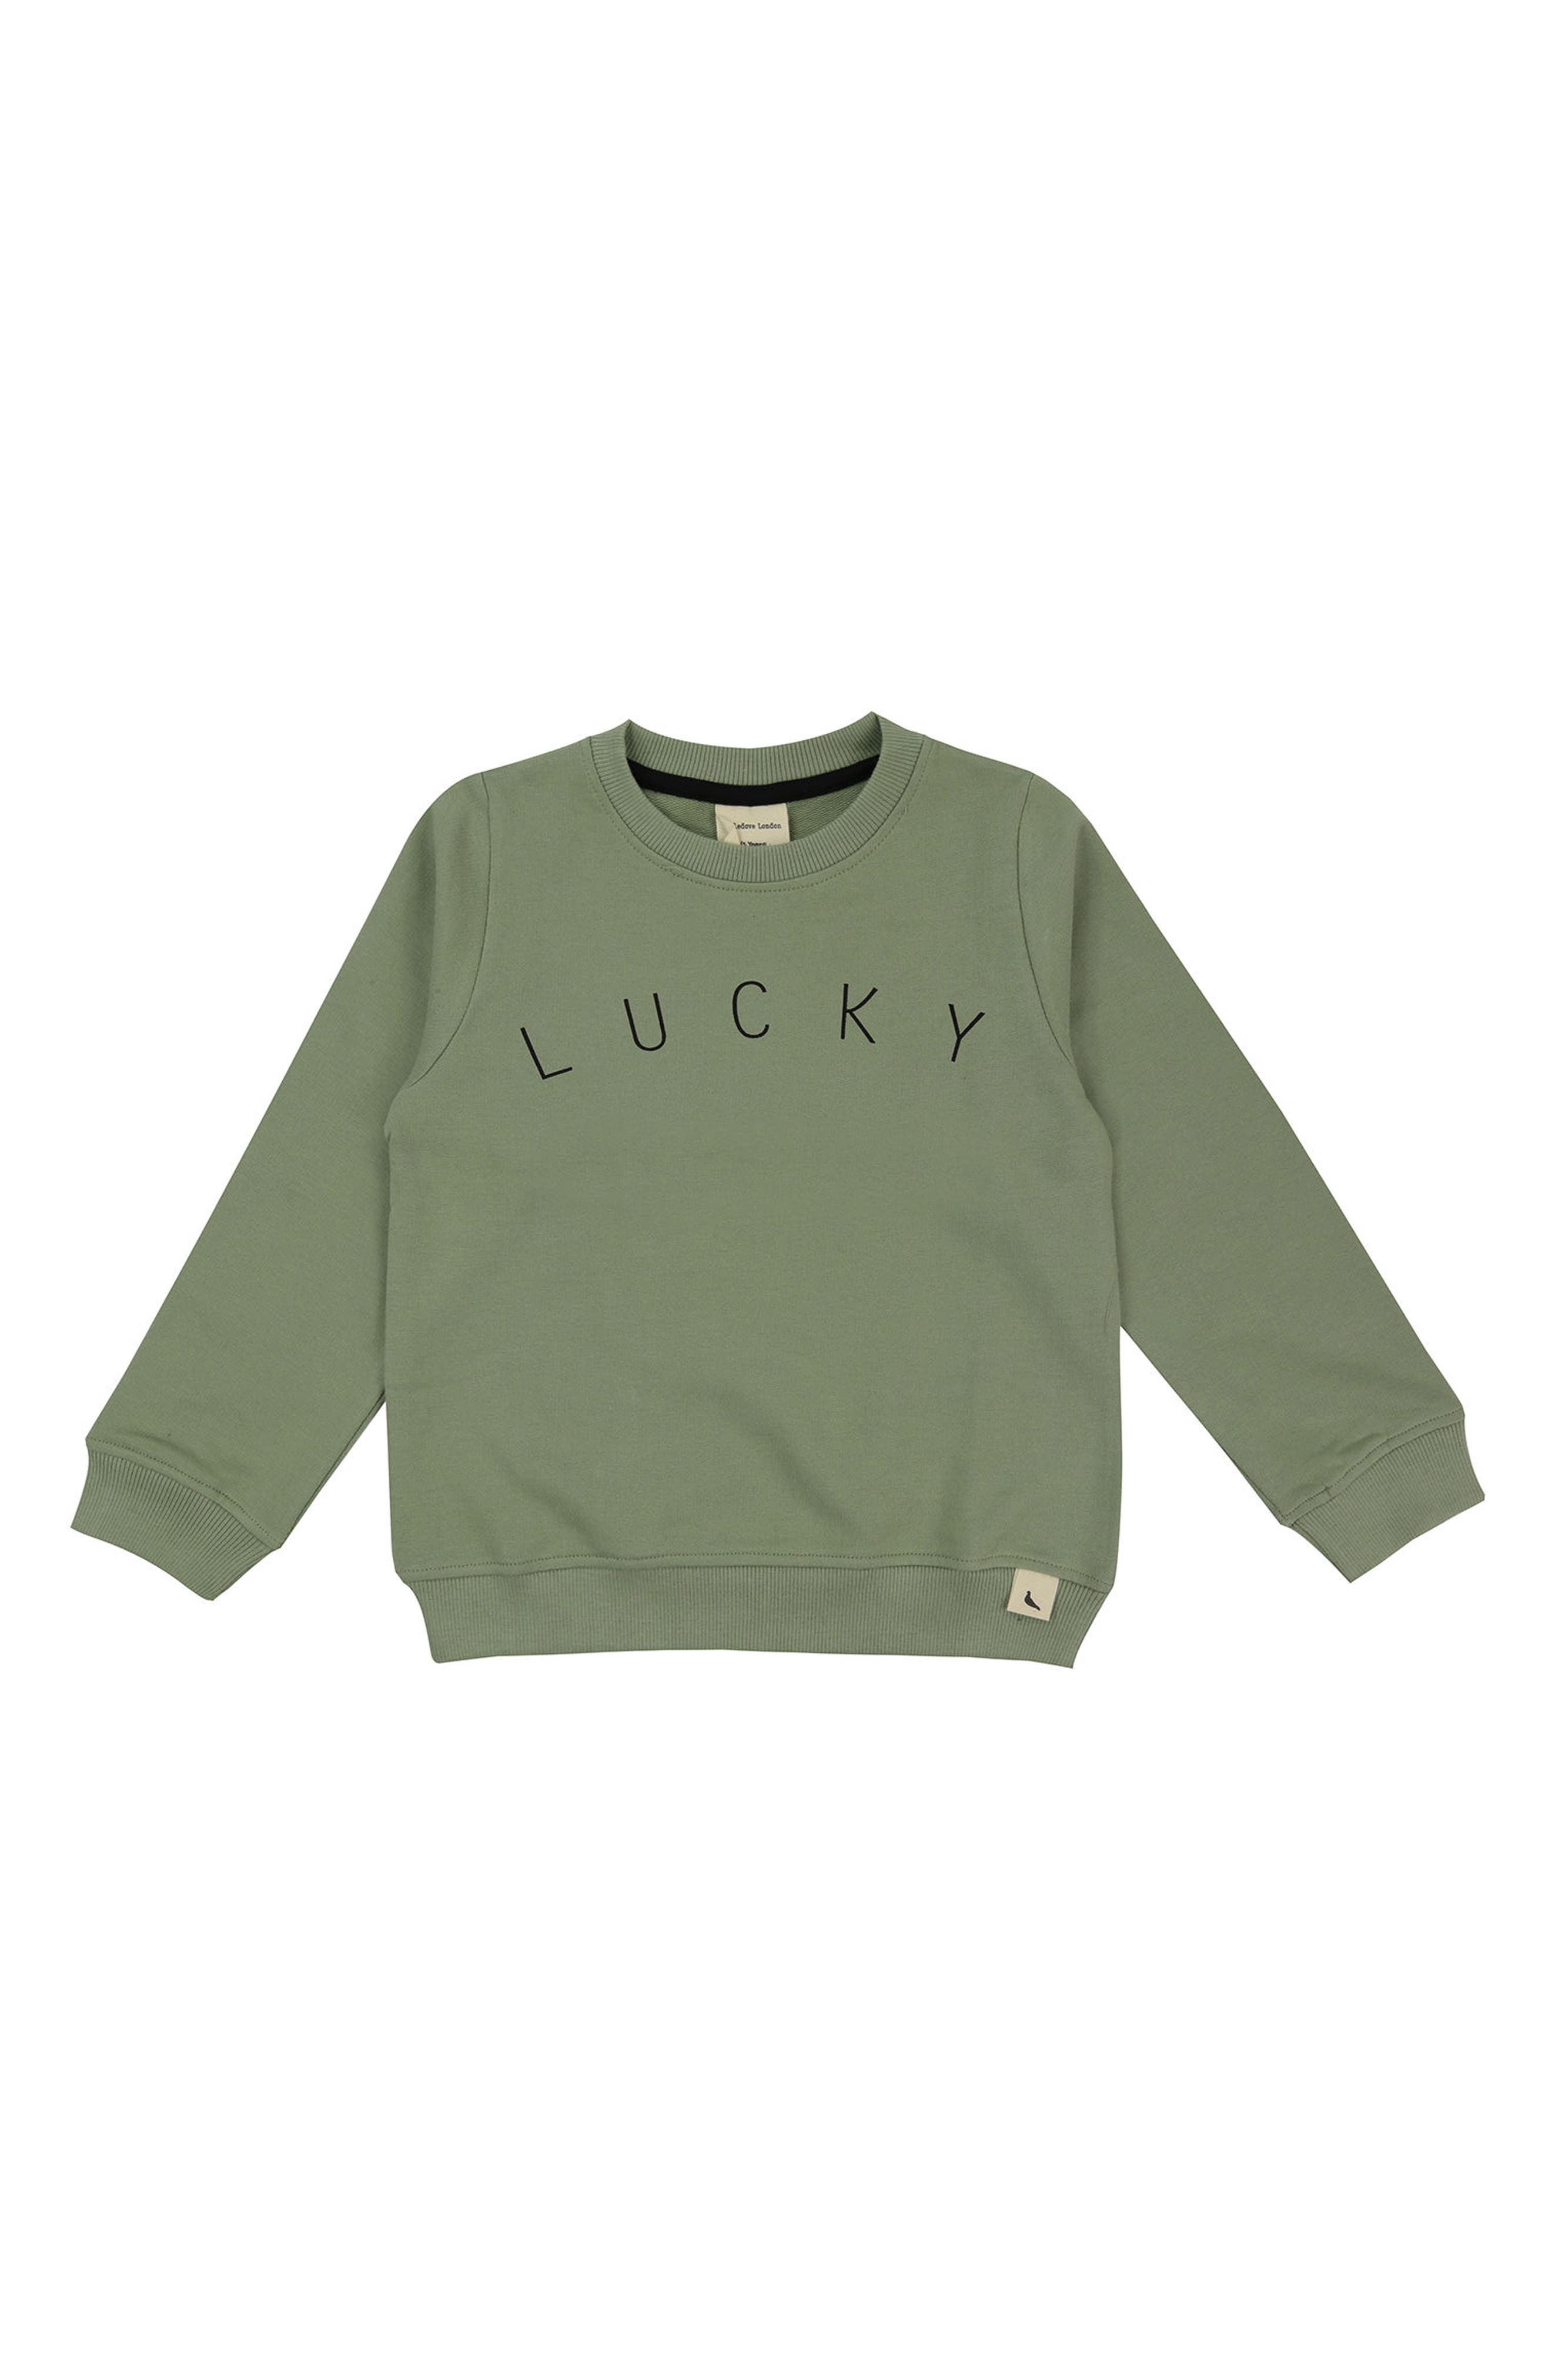 Lucky Sweatshirt,                         Main,                         color, Sage